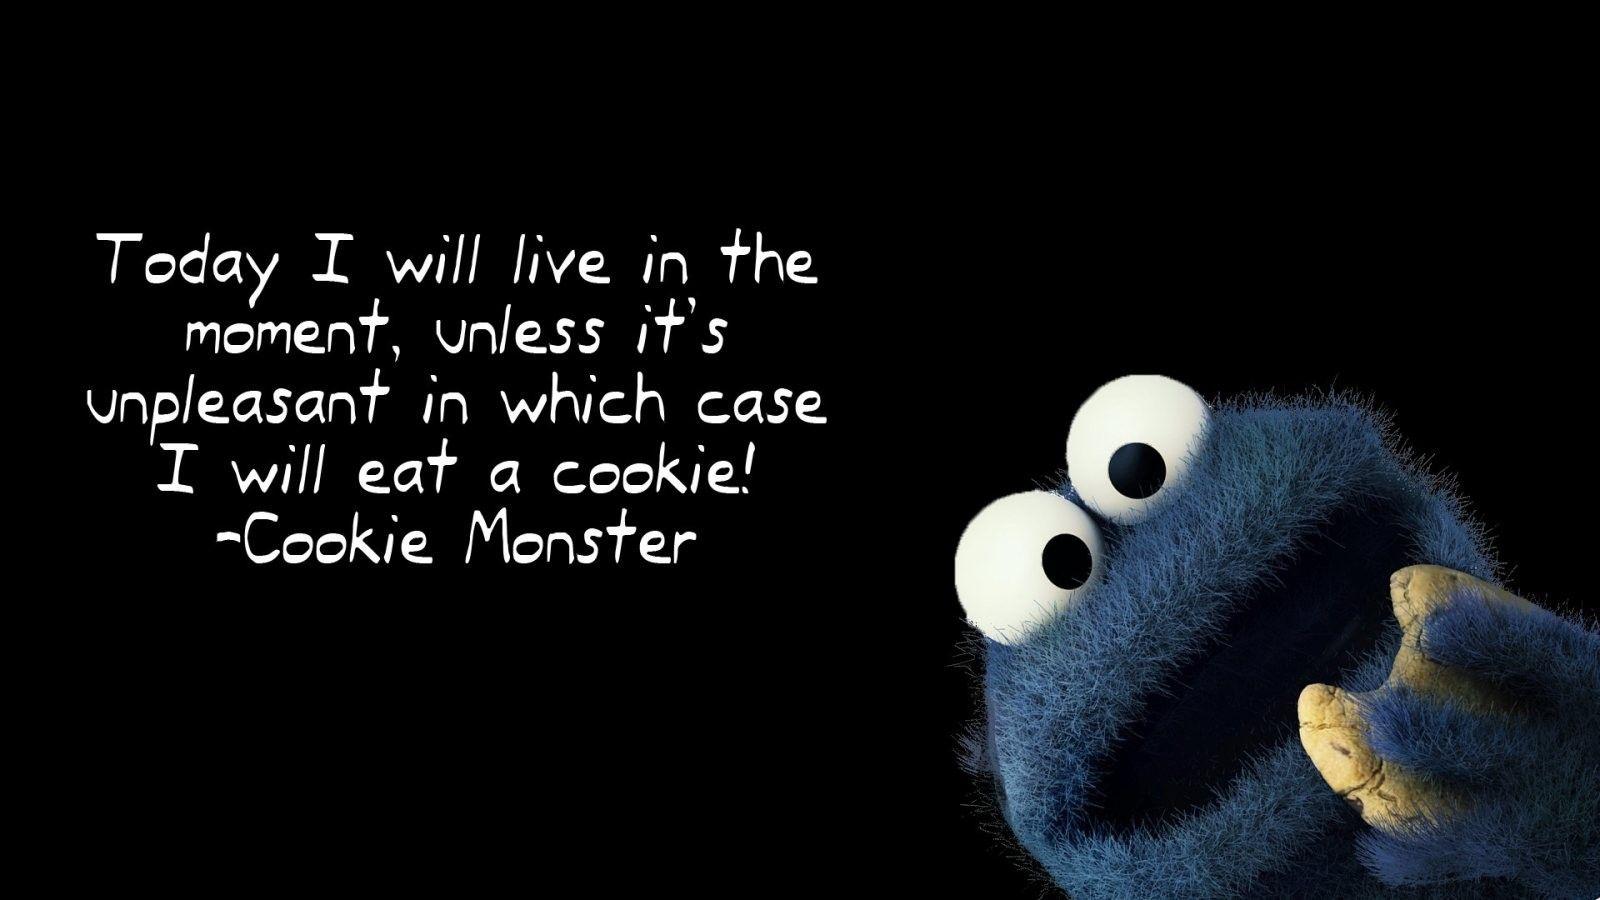 Cookie Monster Wallpaper Cookie Monster Hd Wallpaper Wallpaper